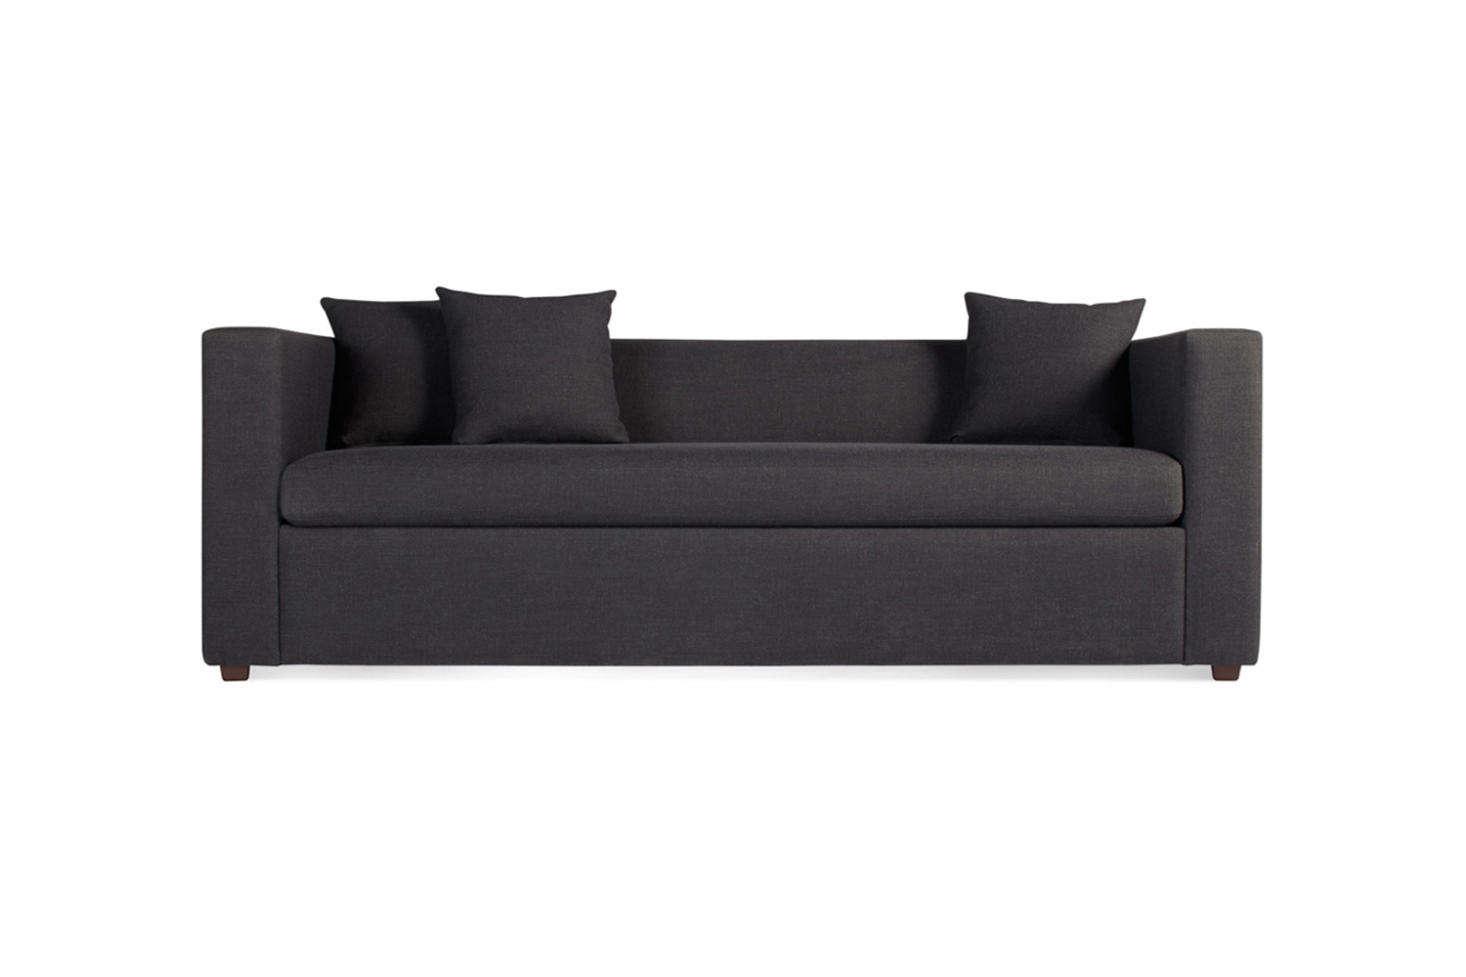 10 Easy Pieces Good Looking Sleeper Sofas Remodelista